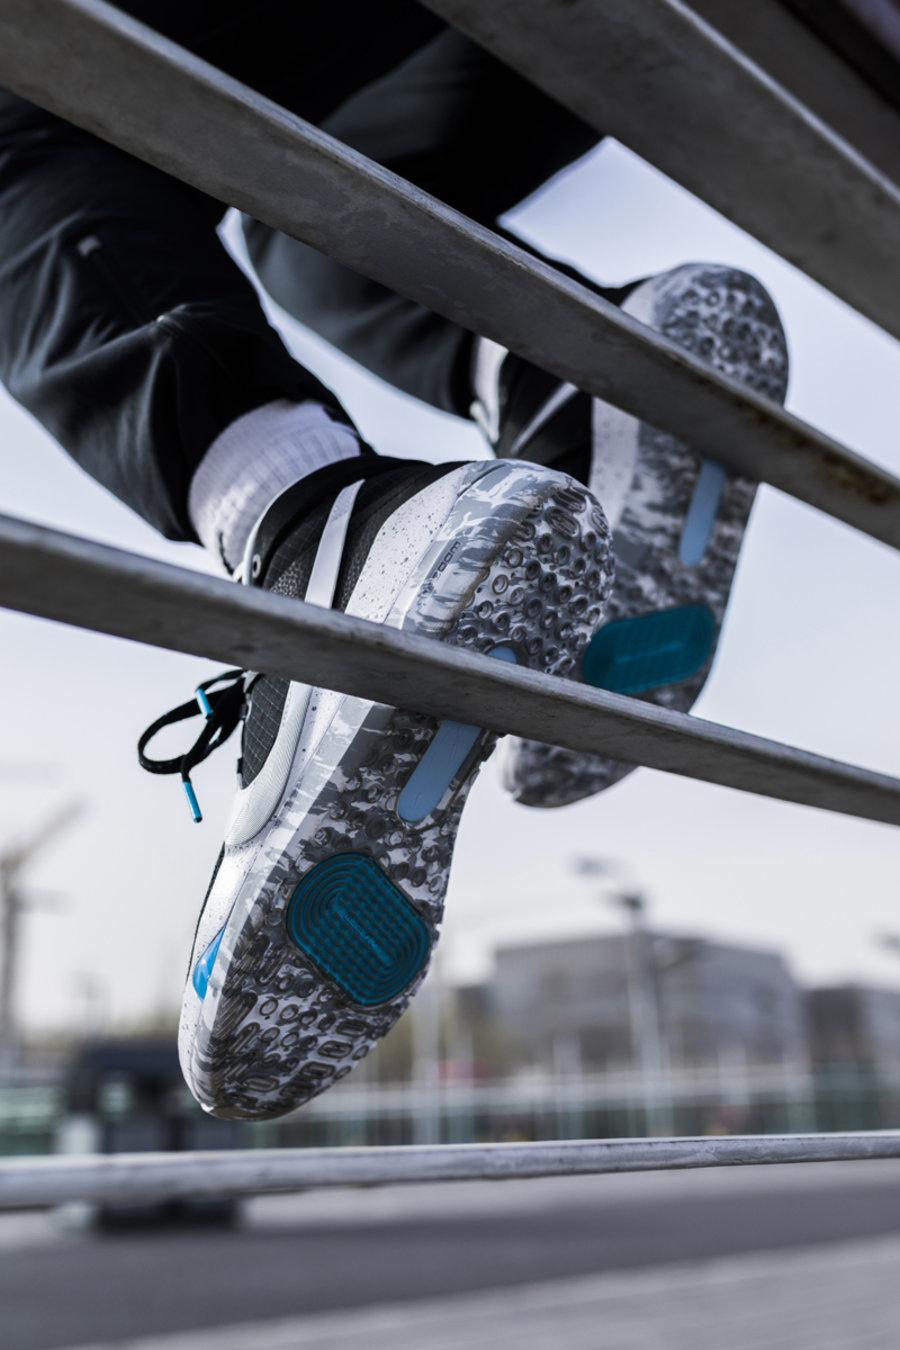 KD13,Nike,发售,上脚,开箱  脚感就是「爽」!杜兰特 KD13 抢先上脚!气垫配置前所未有!